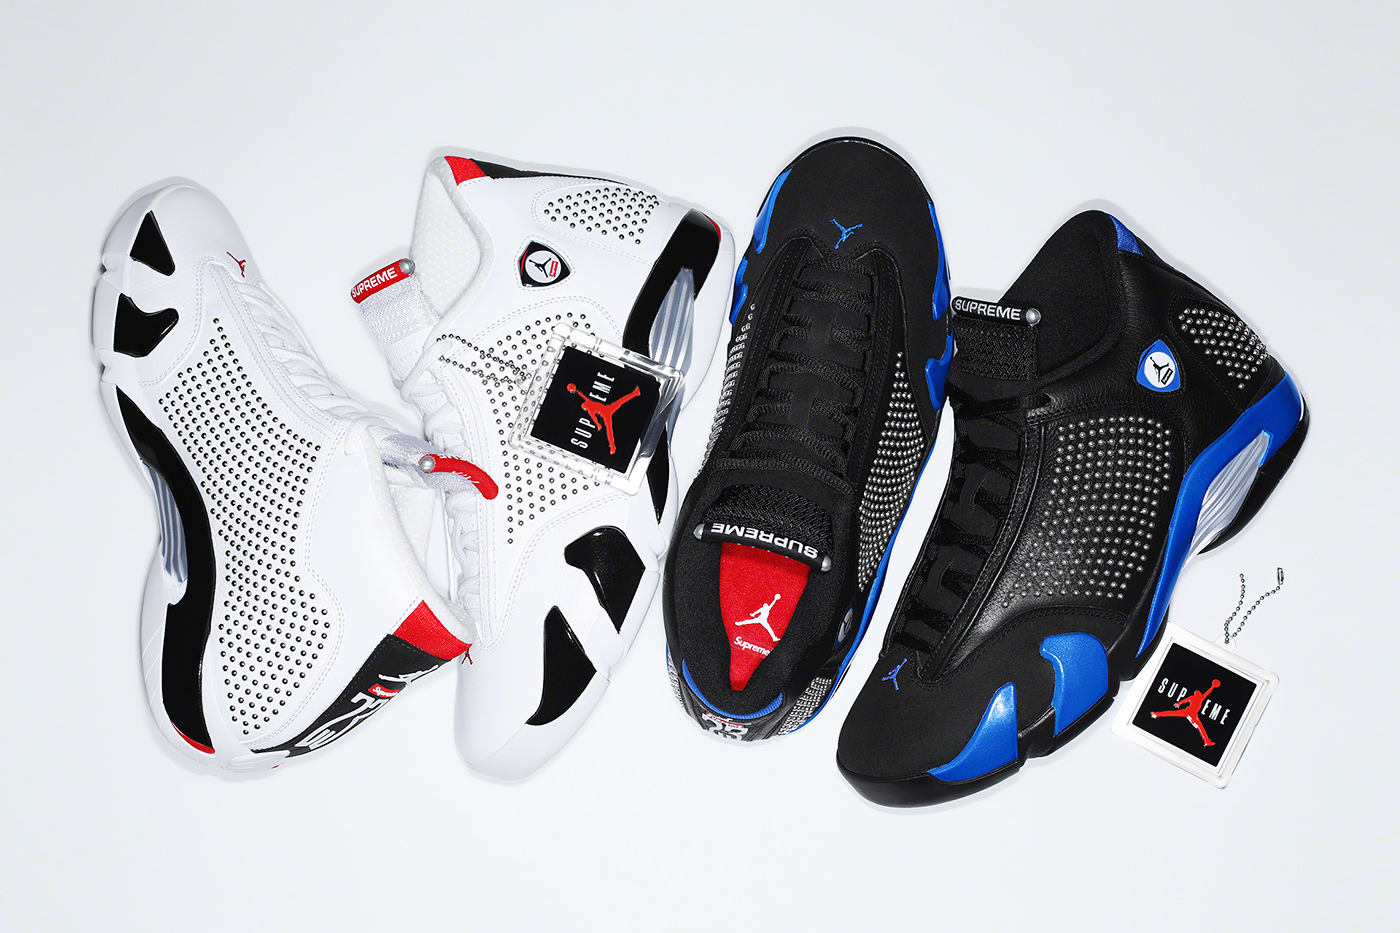 Supreme x Air Jordan 14 联名系列正式发布